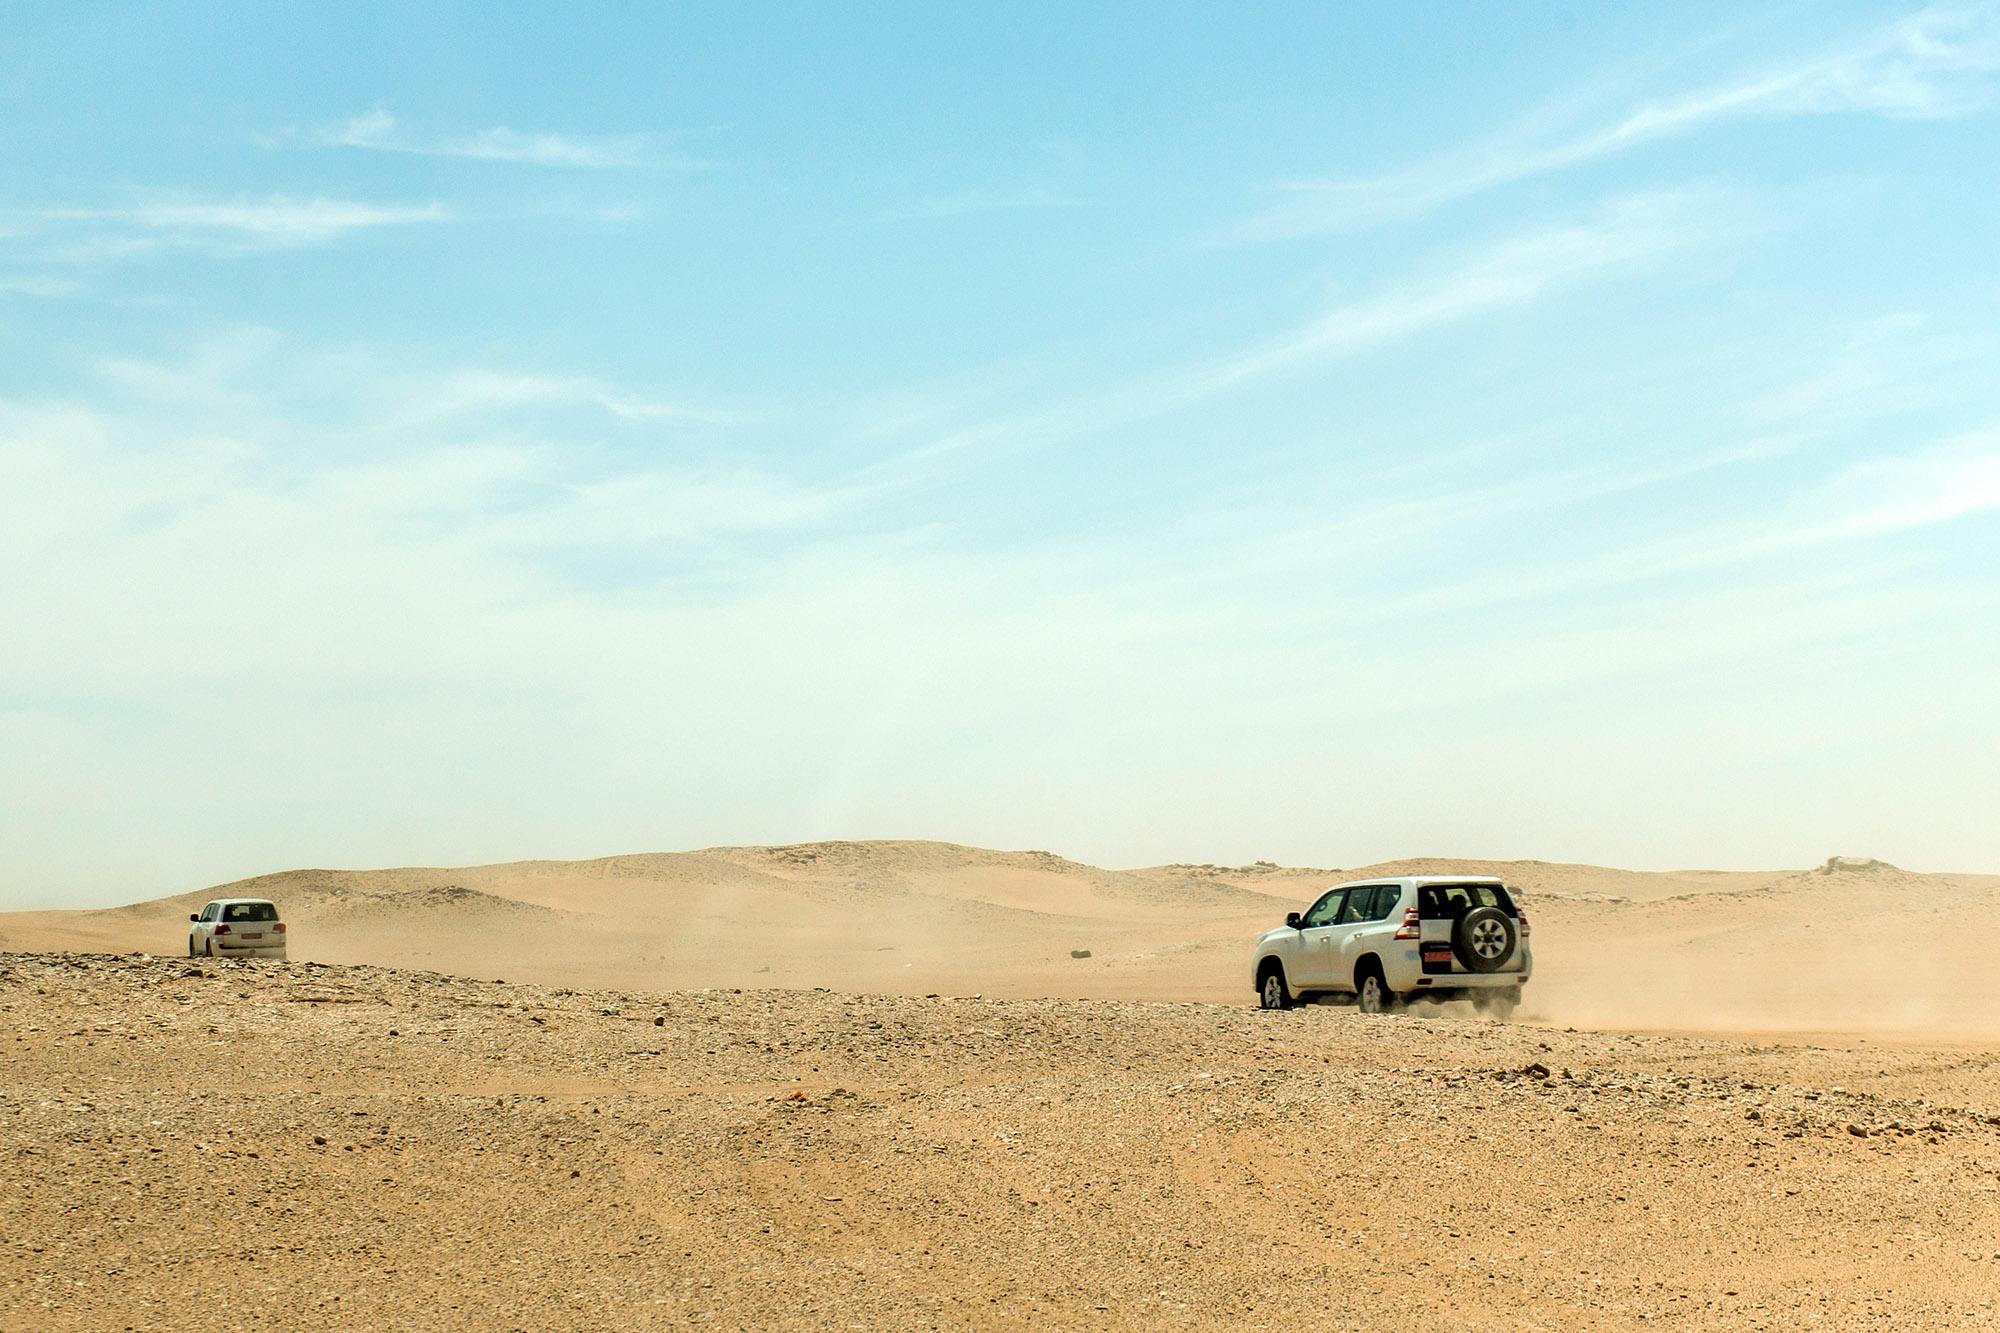 Jeeps traditional Safari Dune Bashing with tourists Oman Ubar in Desert Rub al Khali